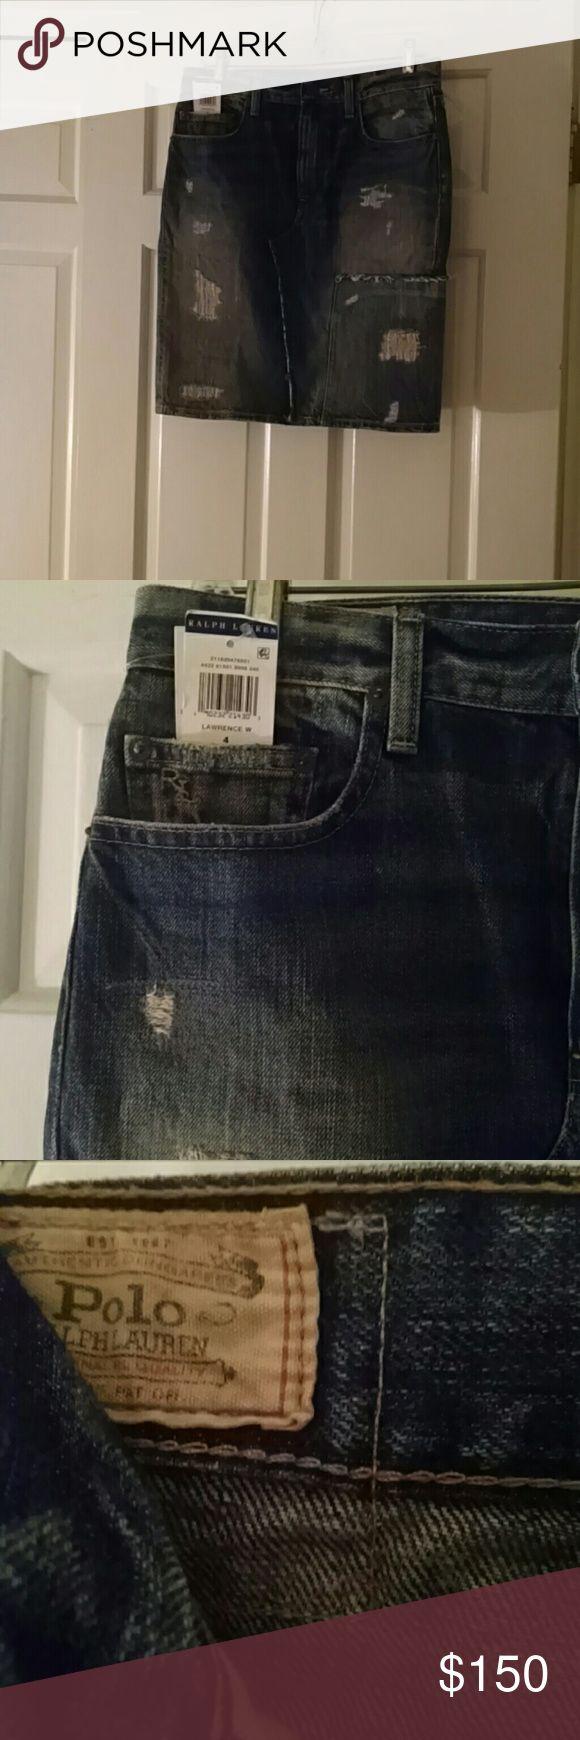 Polo Ralph Lauren distressed denim skirt size 4 Brand new with tags! Polo Ralph Lauren distressed denim skirt. Retail $165. Polo by Ralph Lauren Skirts Midi